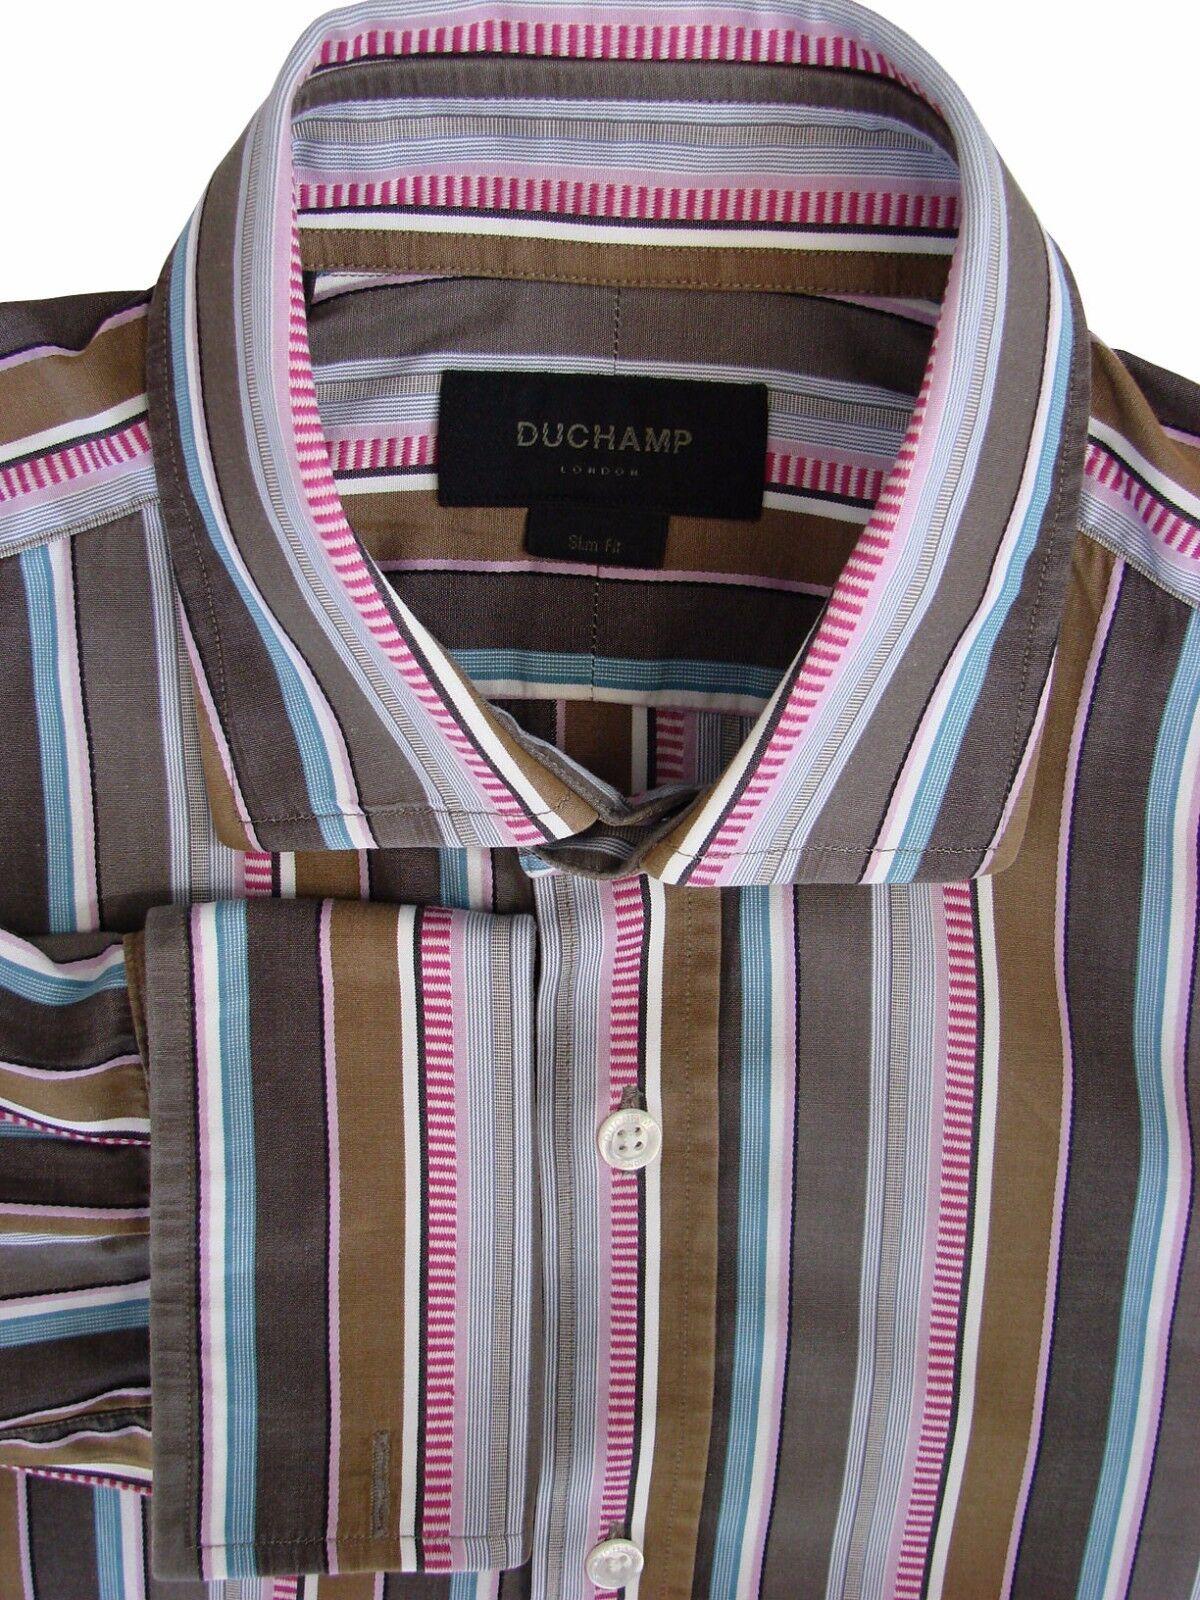 Duchamp London Slim Chemise Homme 15.5 M Marron Multicolore RAYURES Coupe Slim London 46cd67